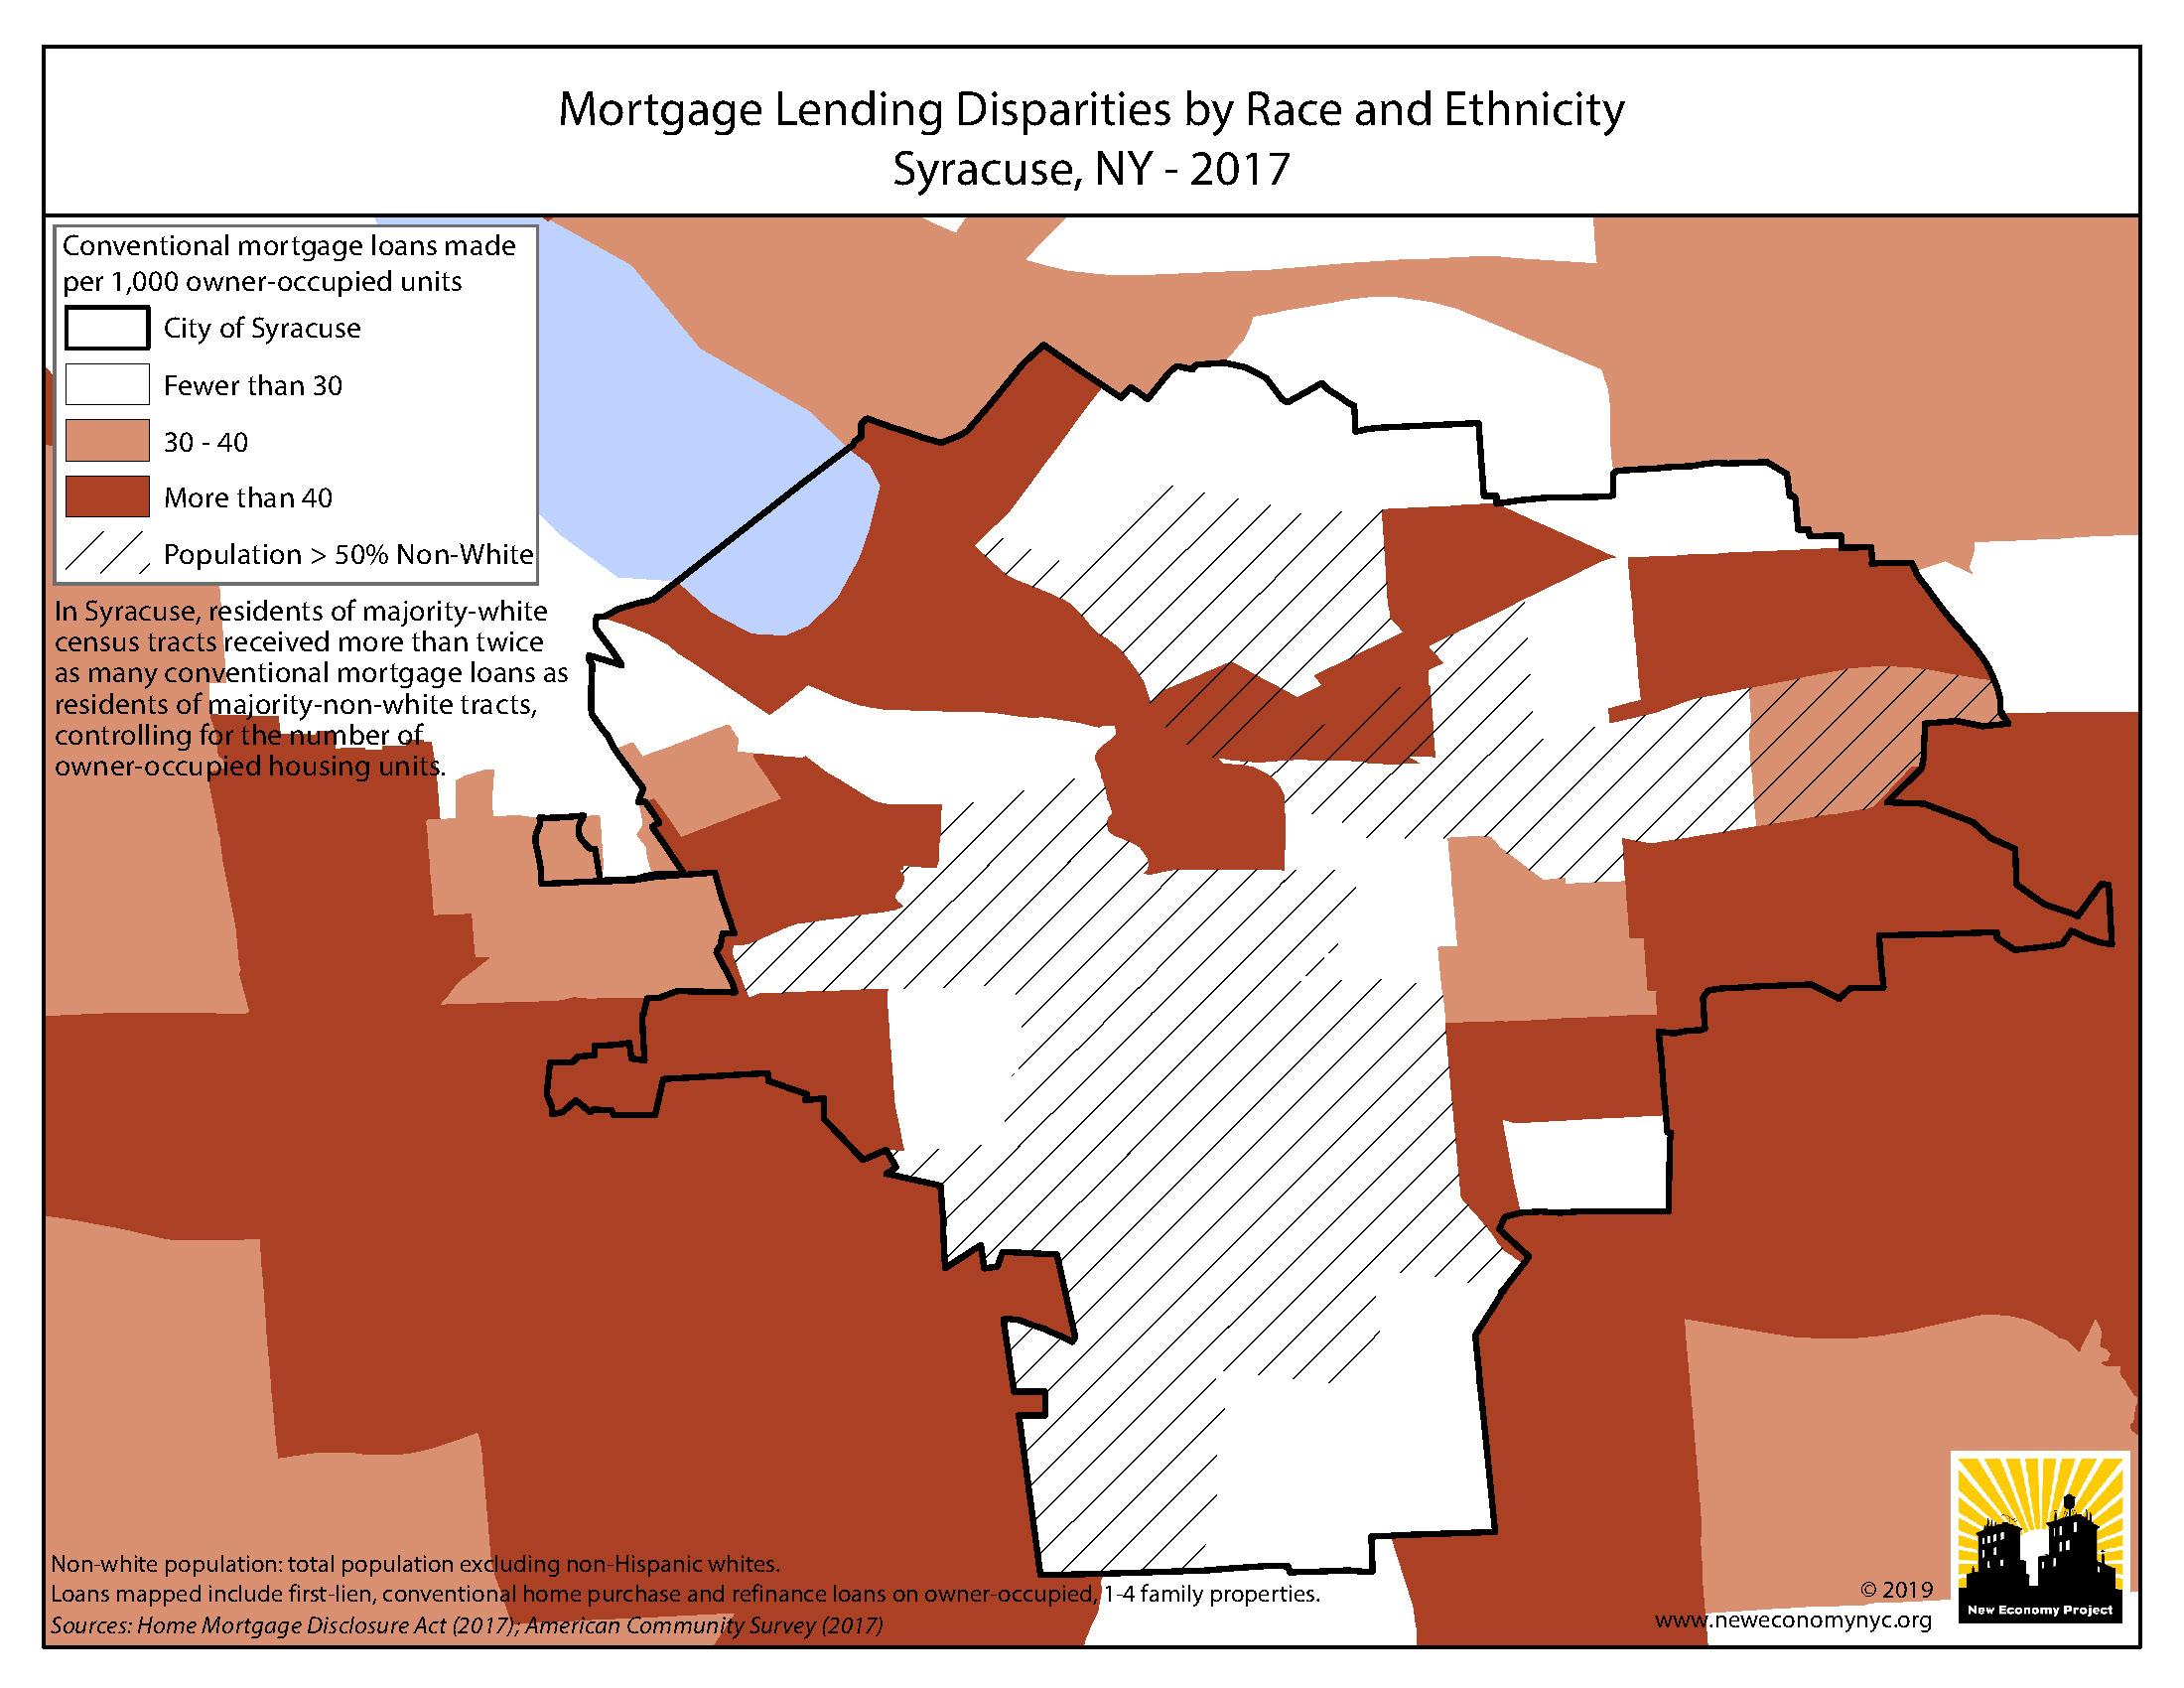 Mortgage Lending Disparities - Syracuse